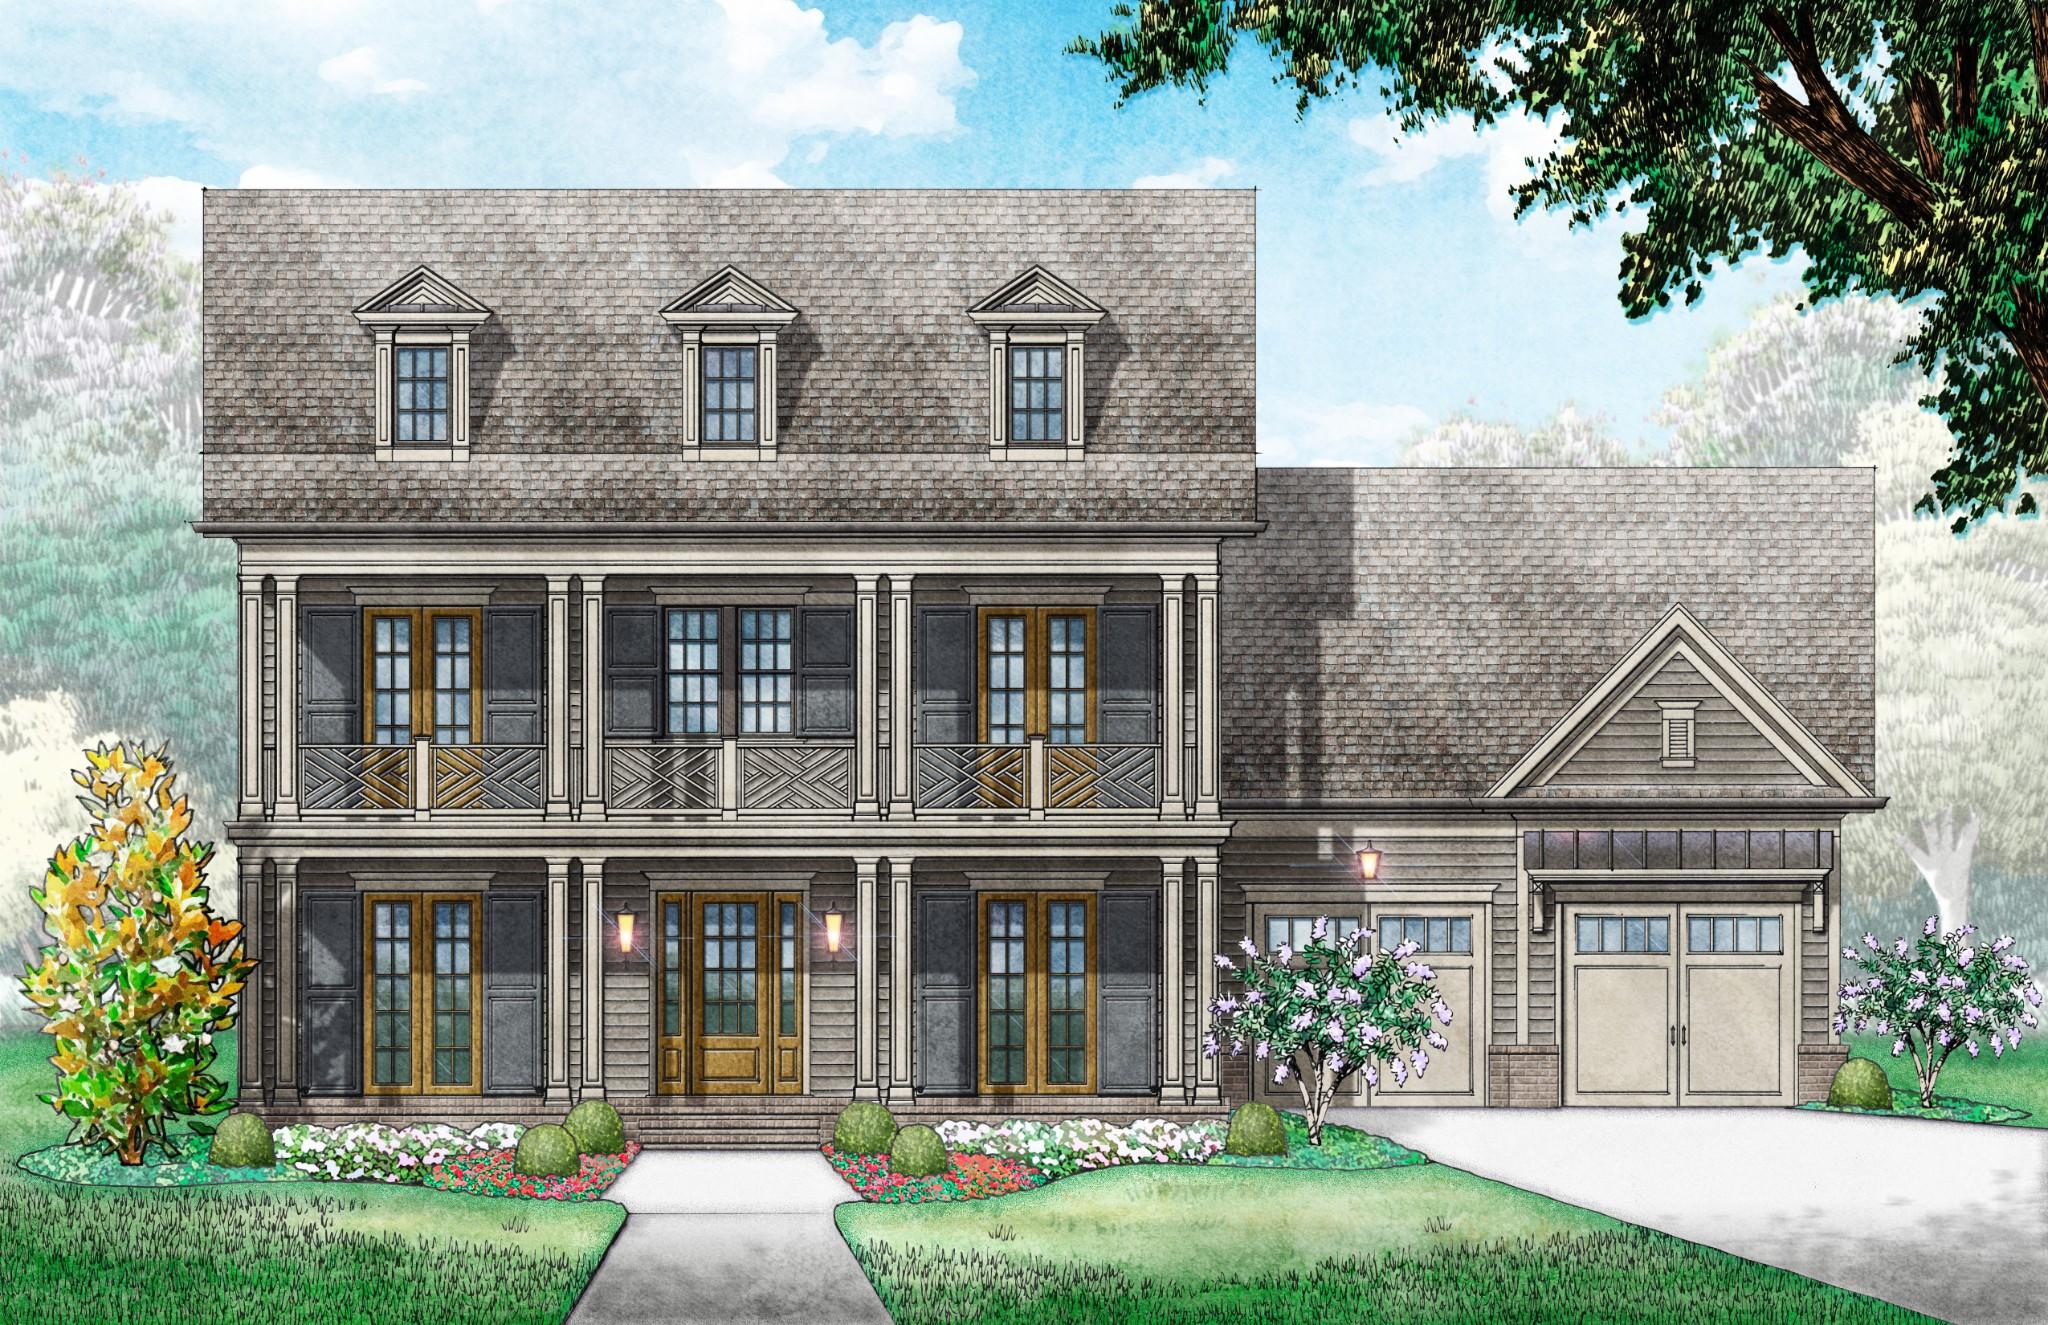 806 Cheltenham Ave, Lot # 2088 Property Photo - Franklin, TN real estate listing